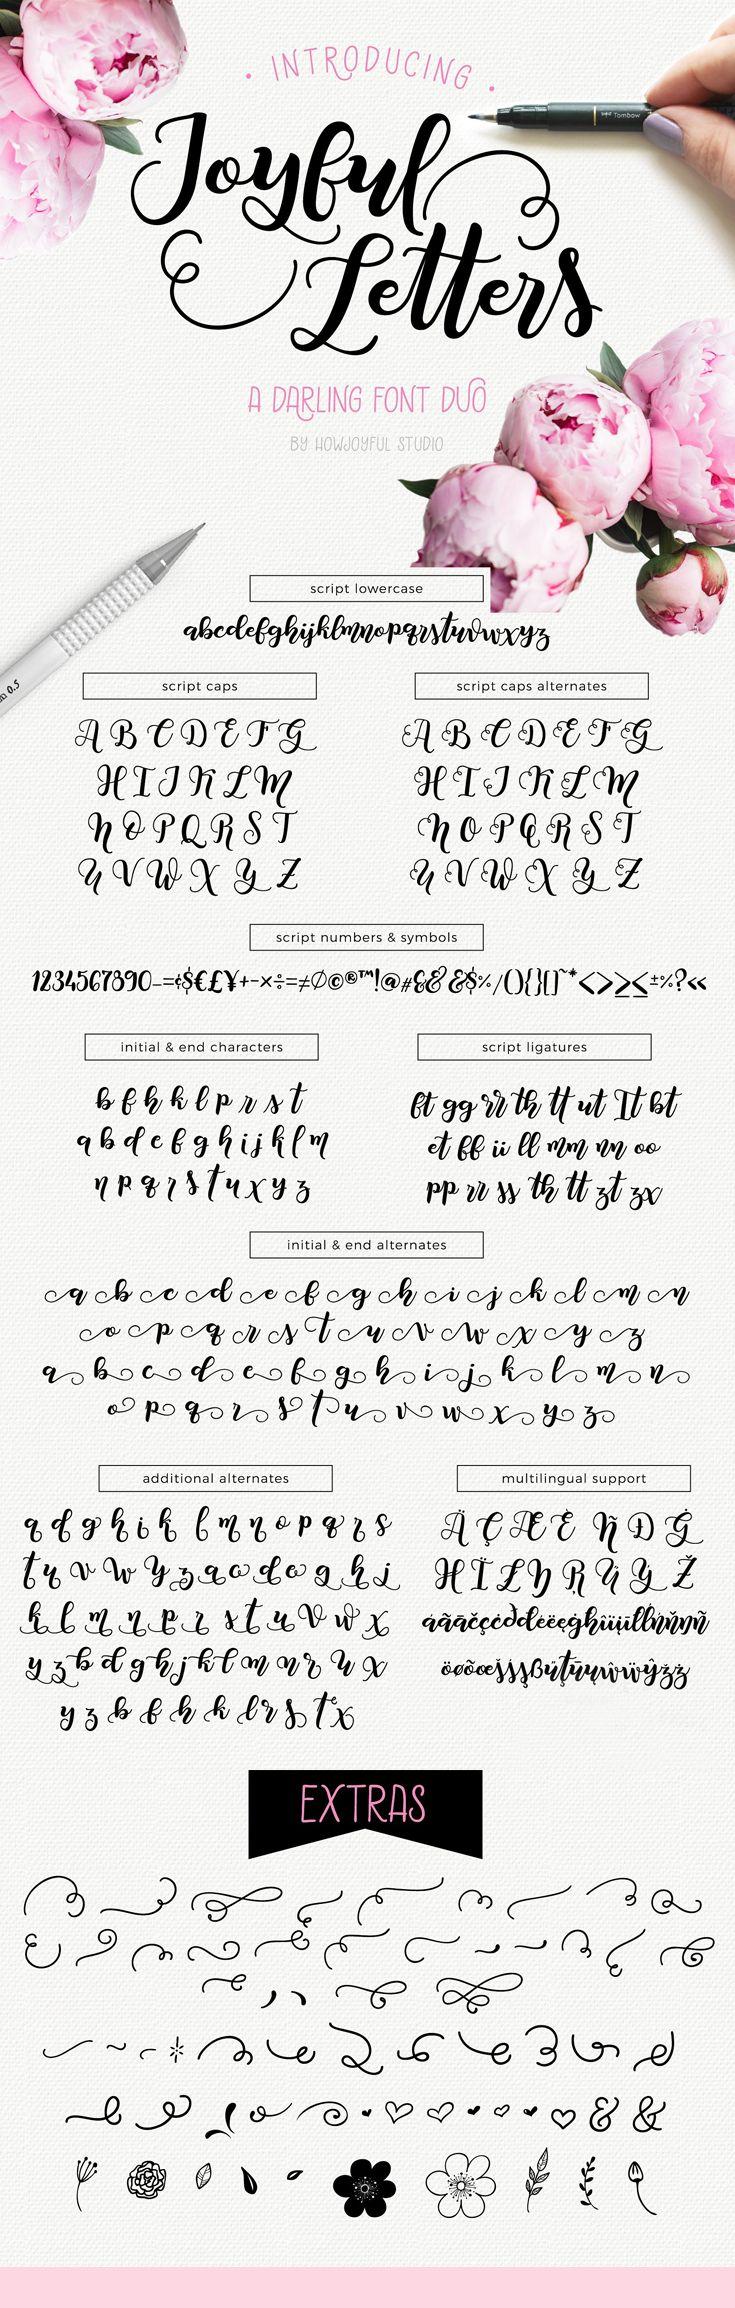 Feminine pretty script font, hand lettered, calligraphy. Fonts for branding, logos, design, commercial use.